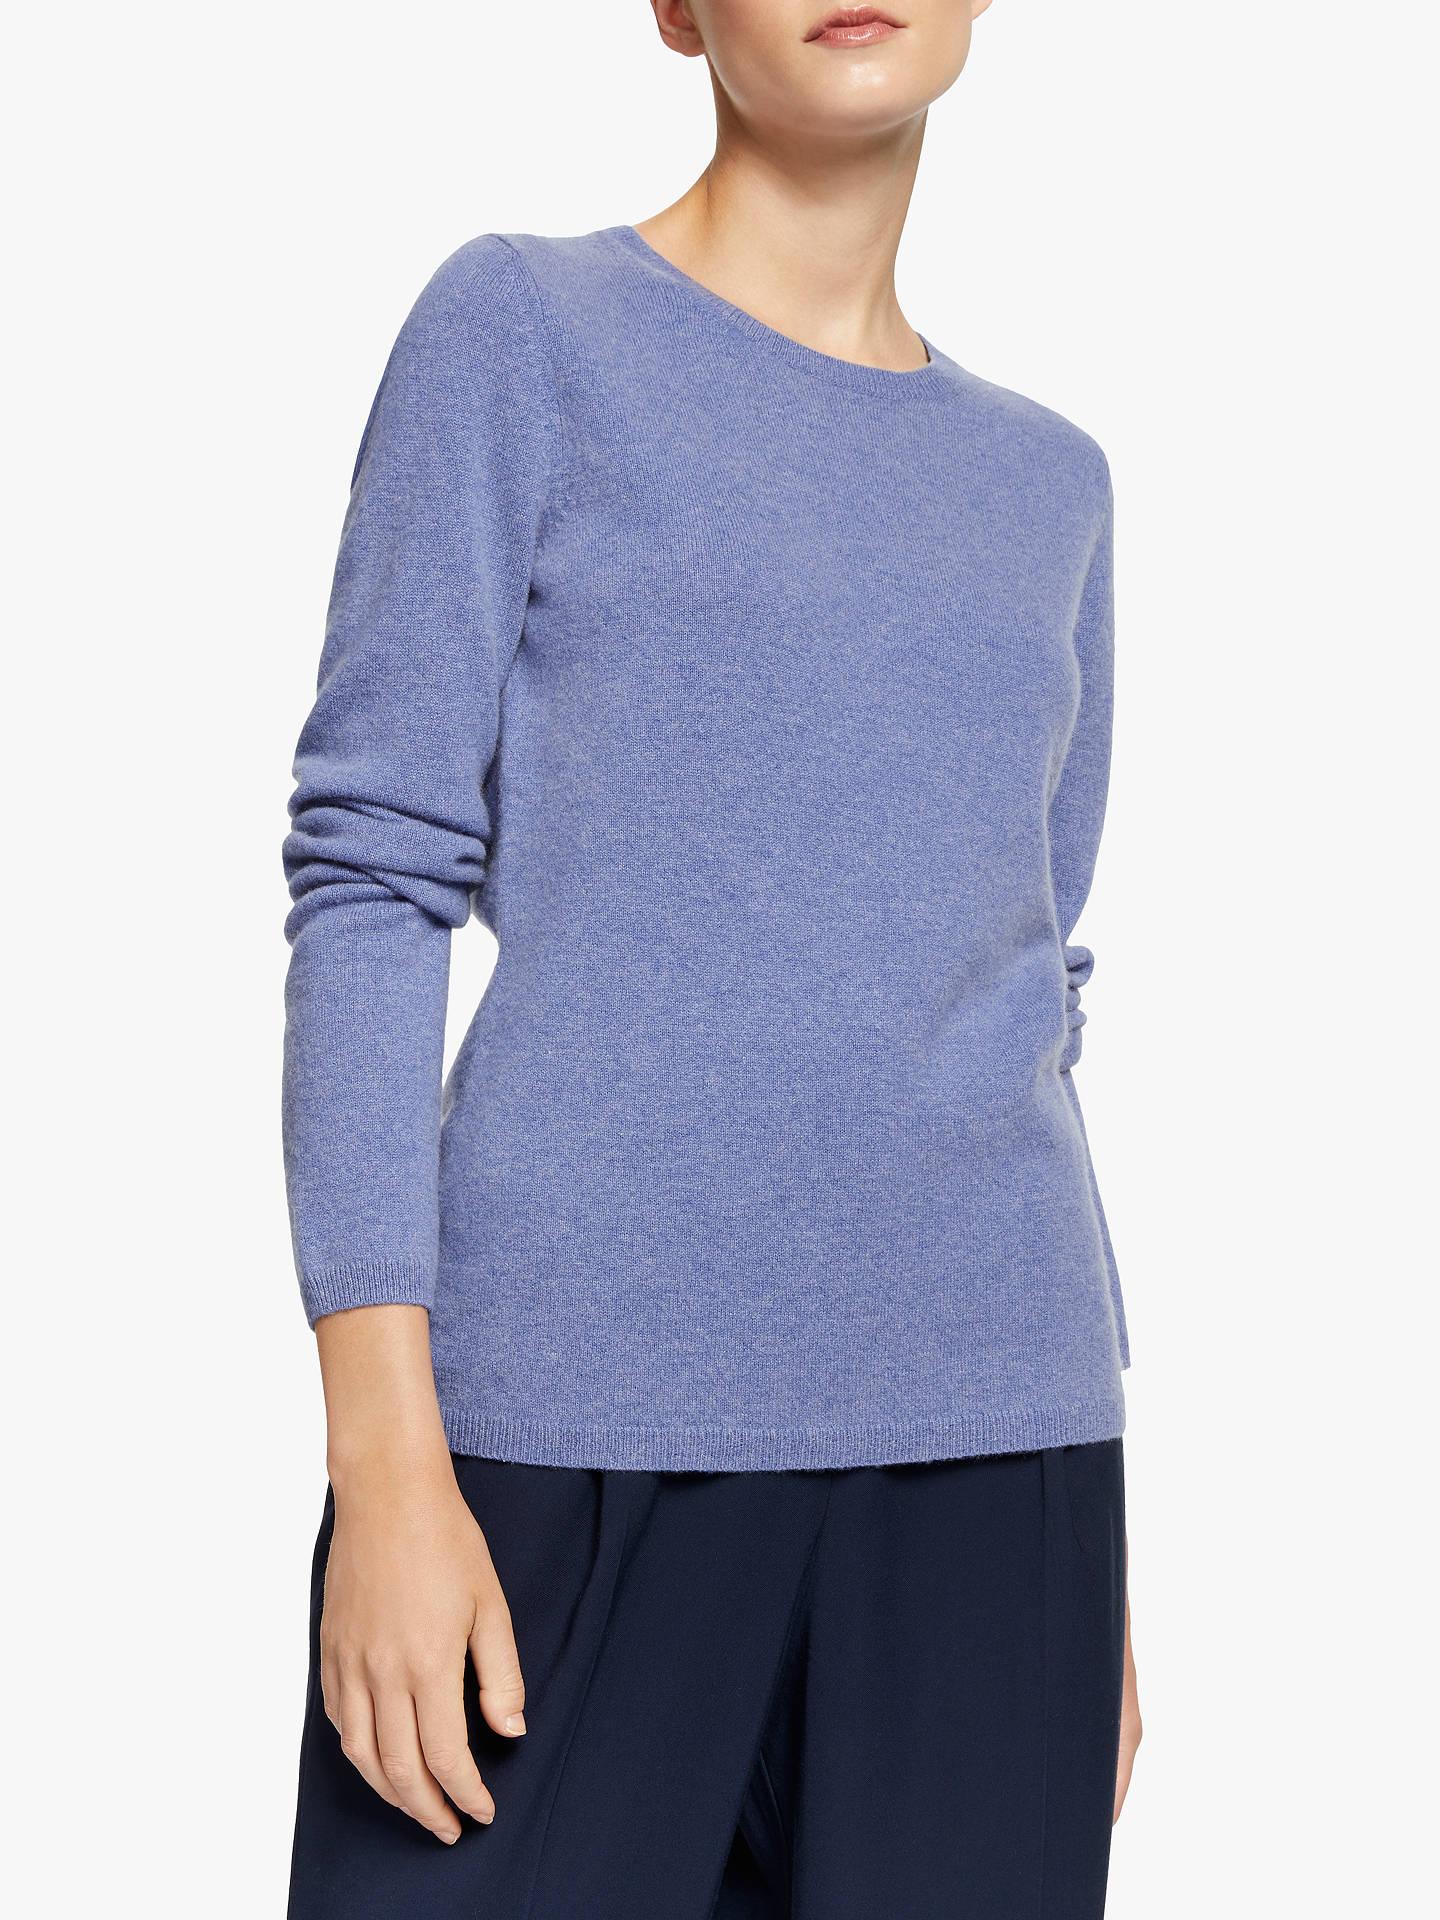 John Lewis & Partners Cashmere Crew Neck Sweater at John